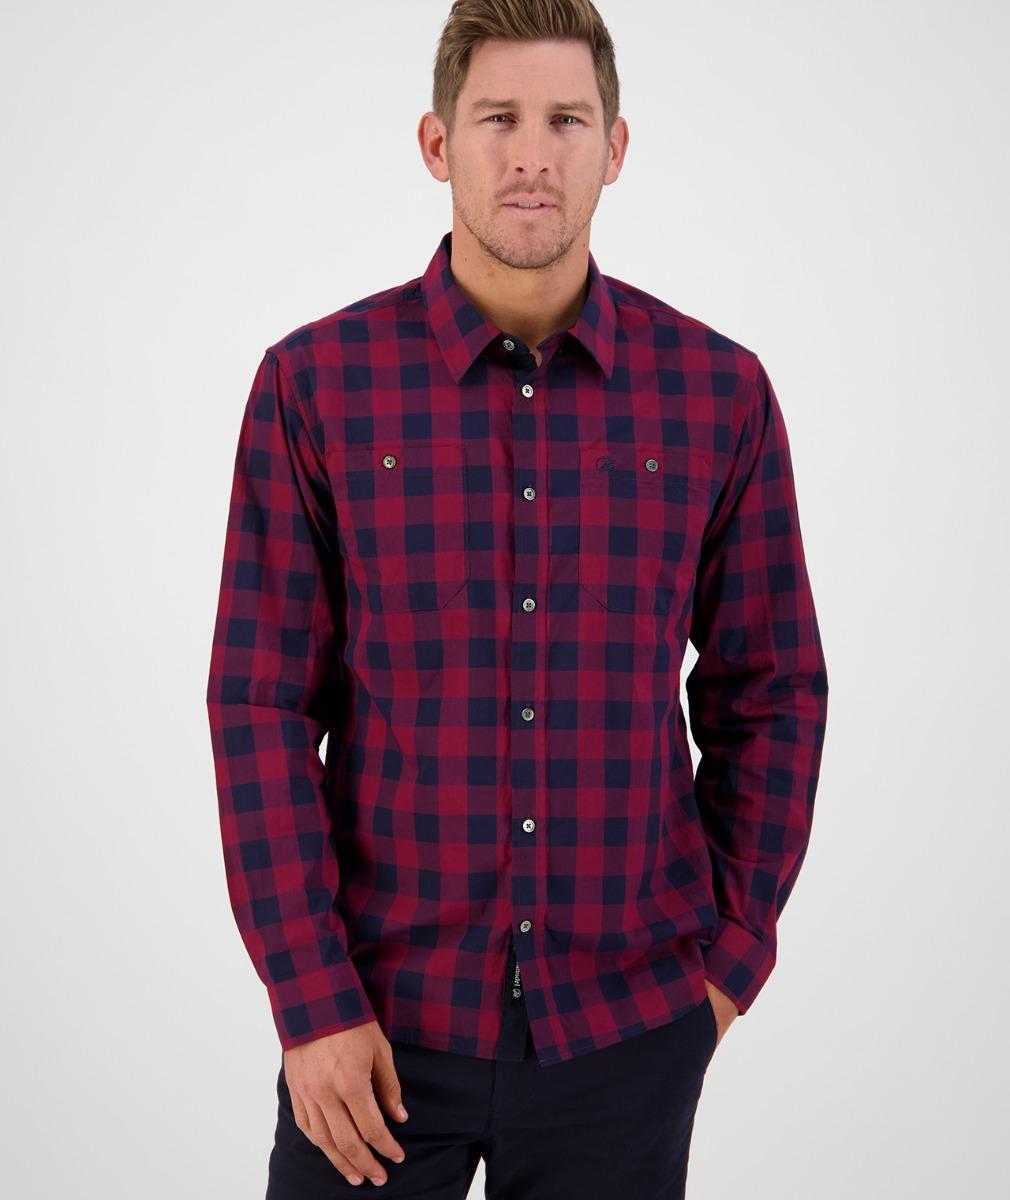 Swanndri Men's Matarangi Shirt in Oxblood/Navy Check